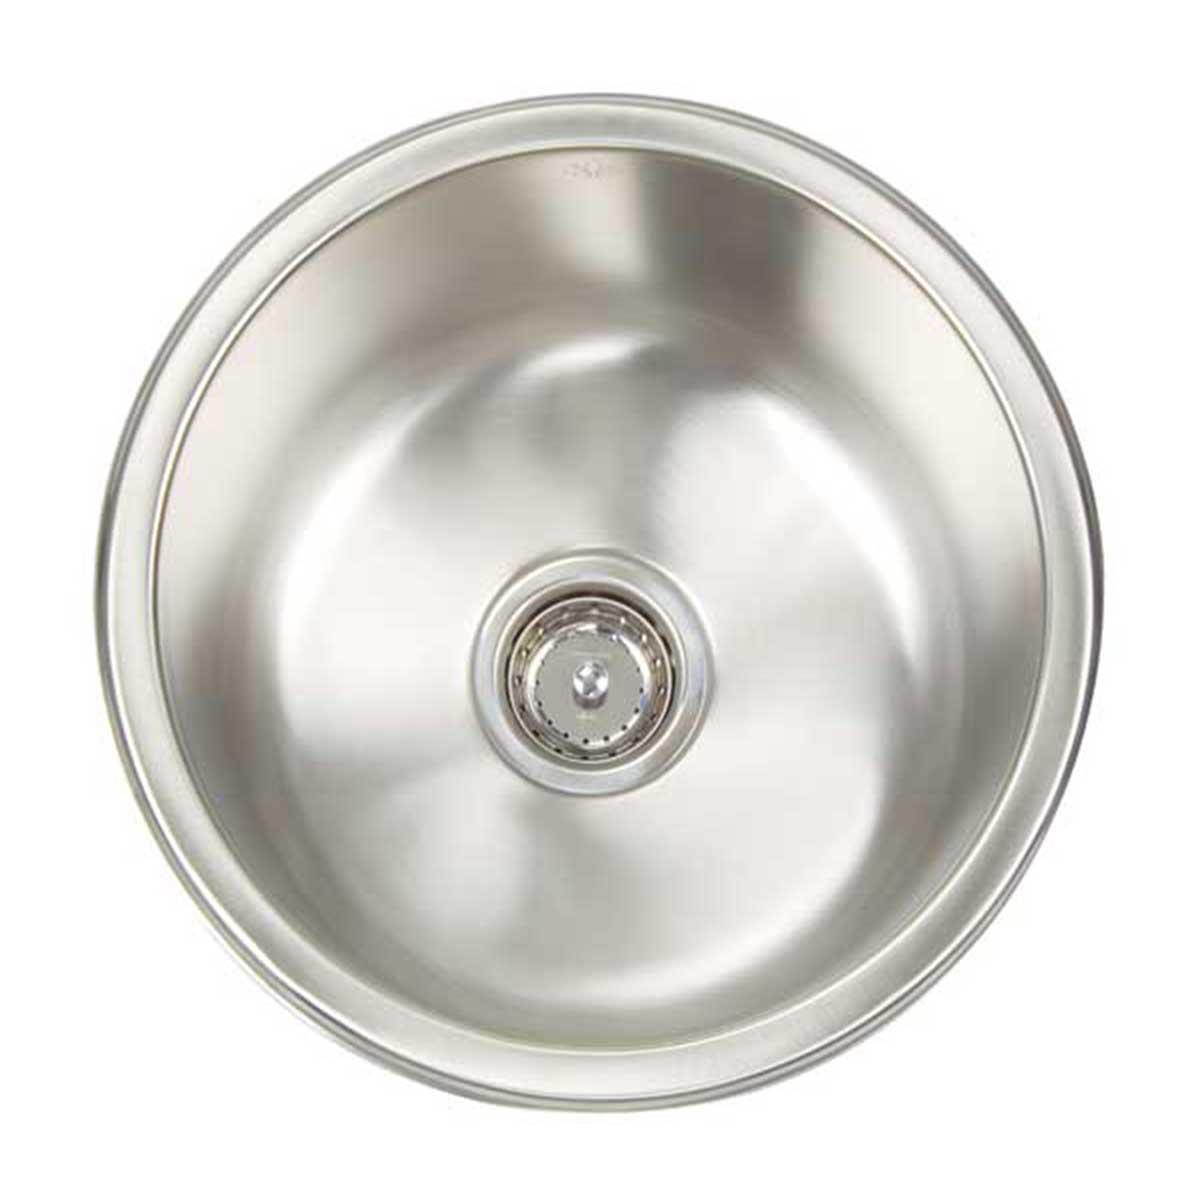 ao16 d8 d artisan sinks 16 gauge     artisan sinks premium series 16 gauge single bowl round   rh   contractorsdirect com